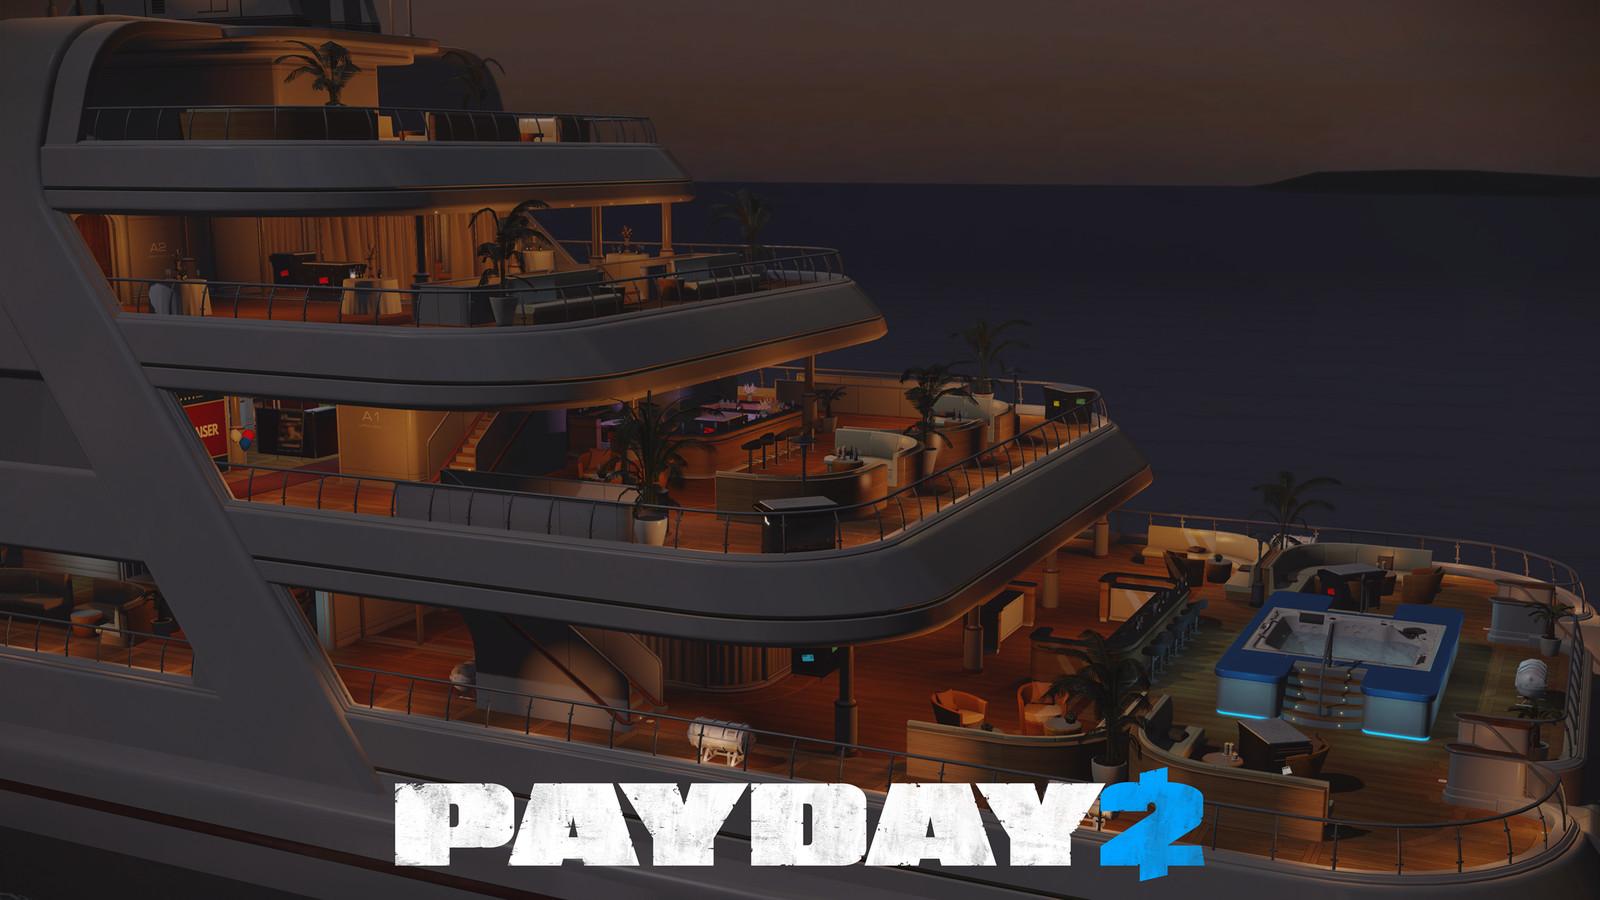 Payday 2: Yacht DLC